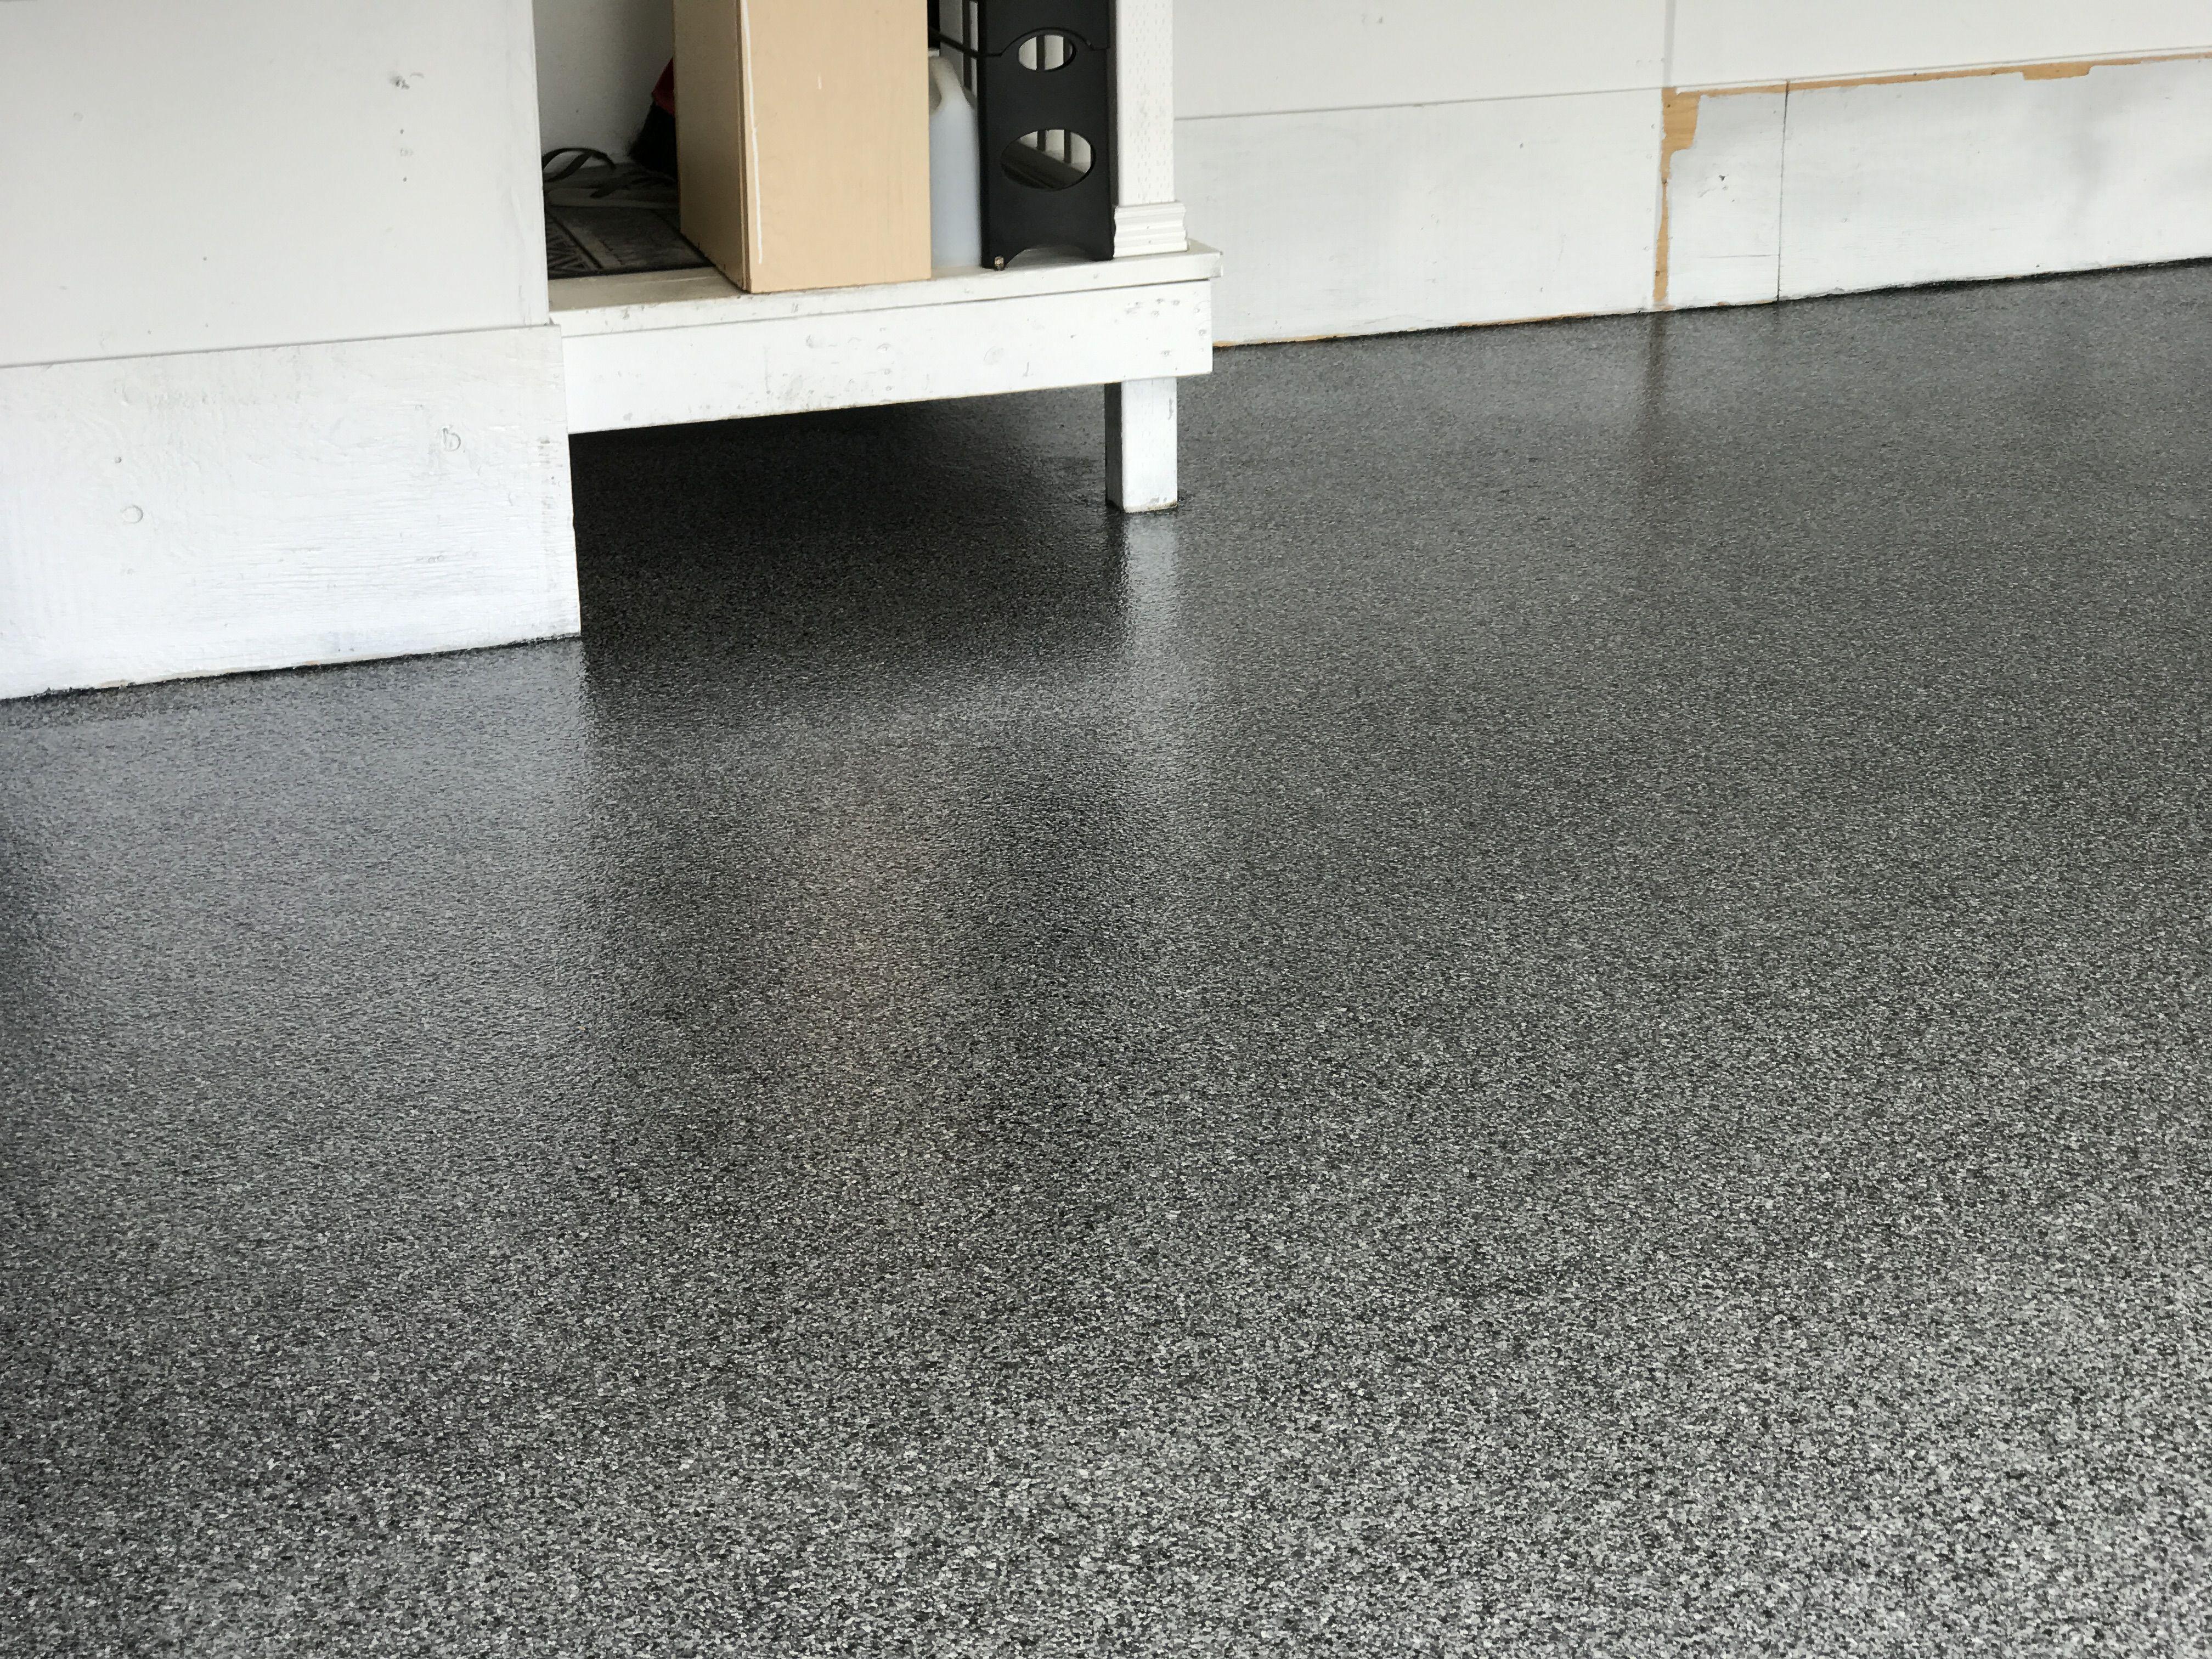 Epoxy Garage Floor Black Basecoat With Nightfall Flakes Completed